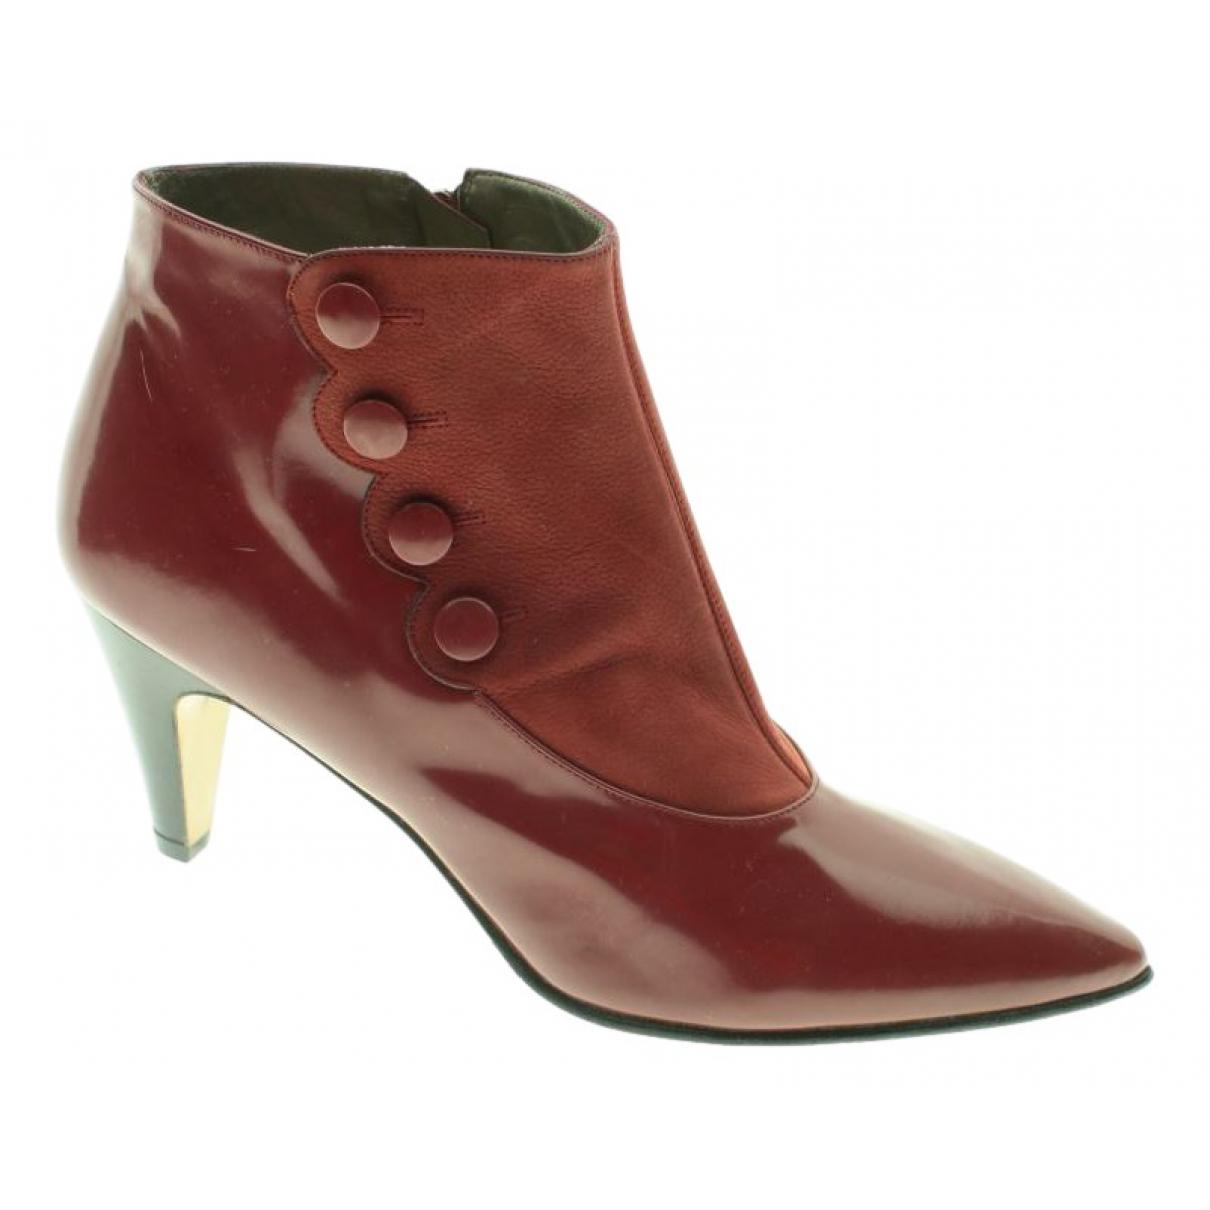 Guy Laroche \N Burgundy Fur Ankle boots for Women 41 EU